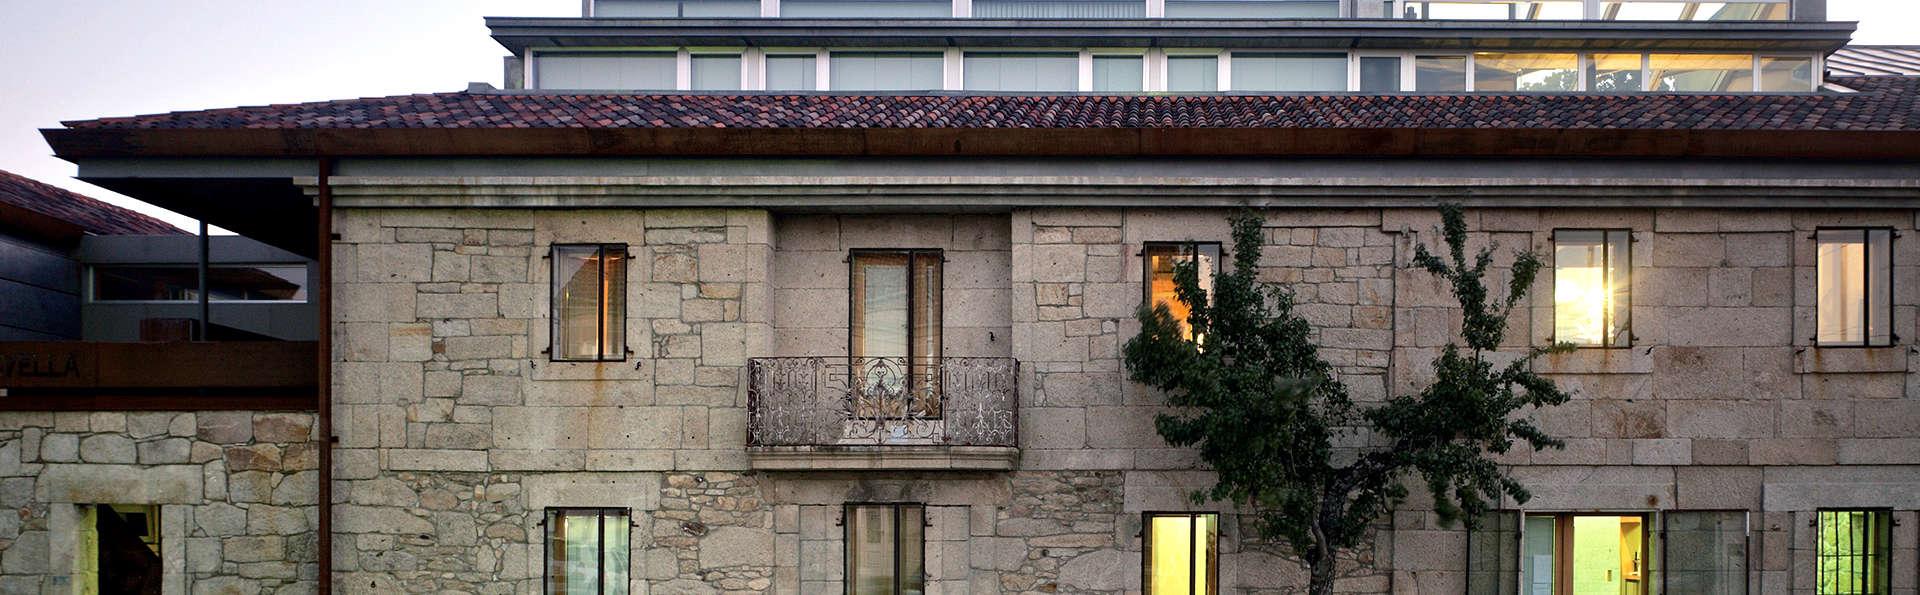 Hotel Spa Vilavella - Edit_Front3.jpg